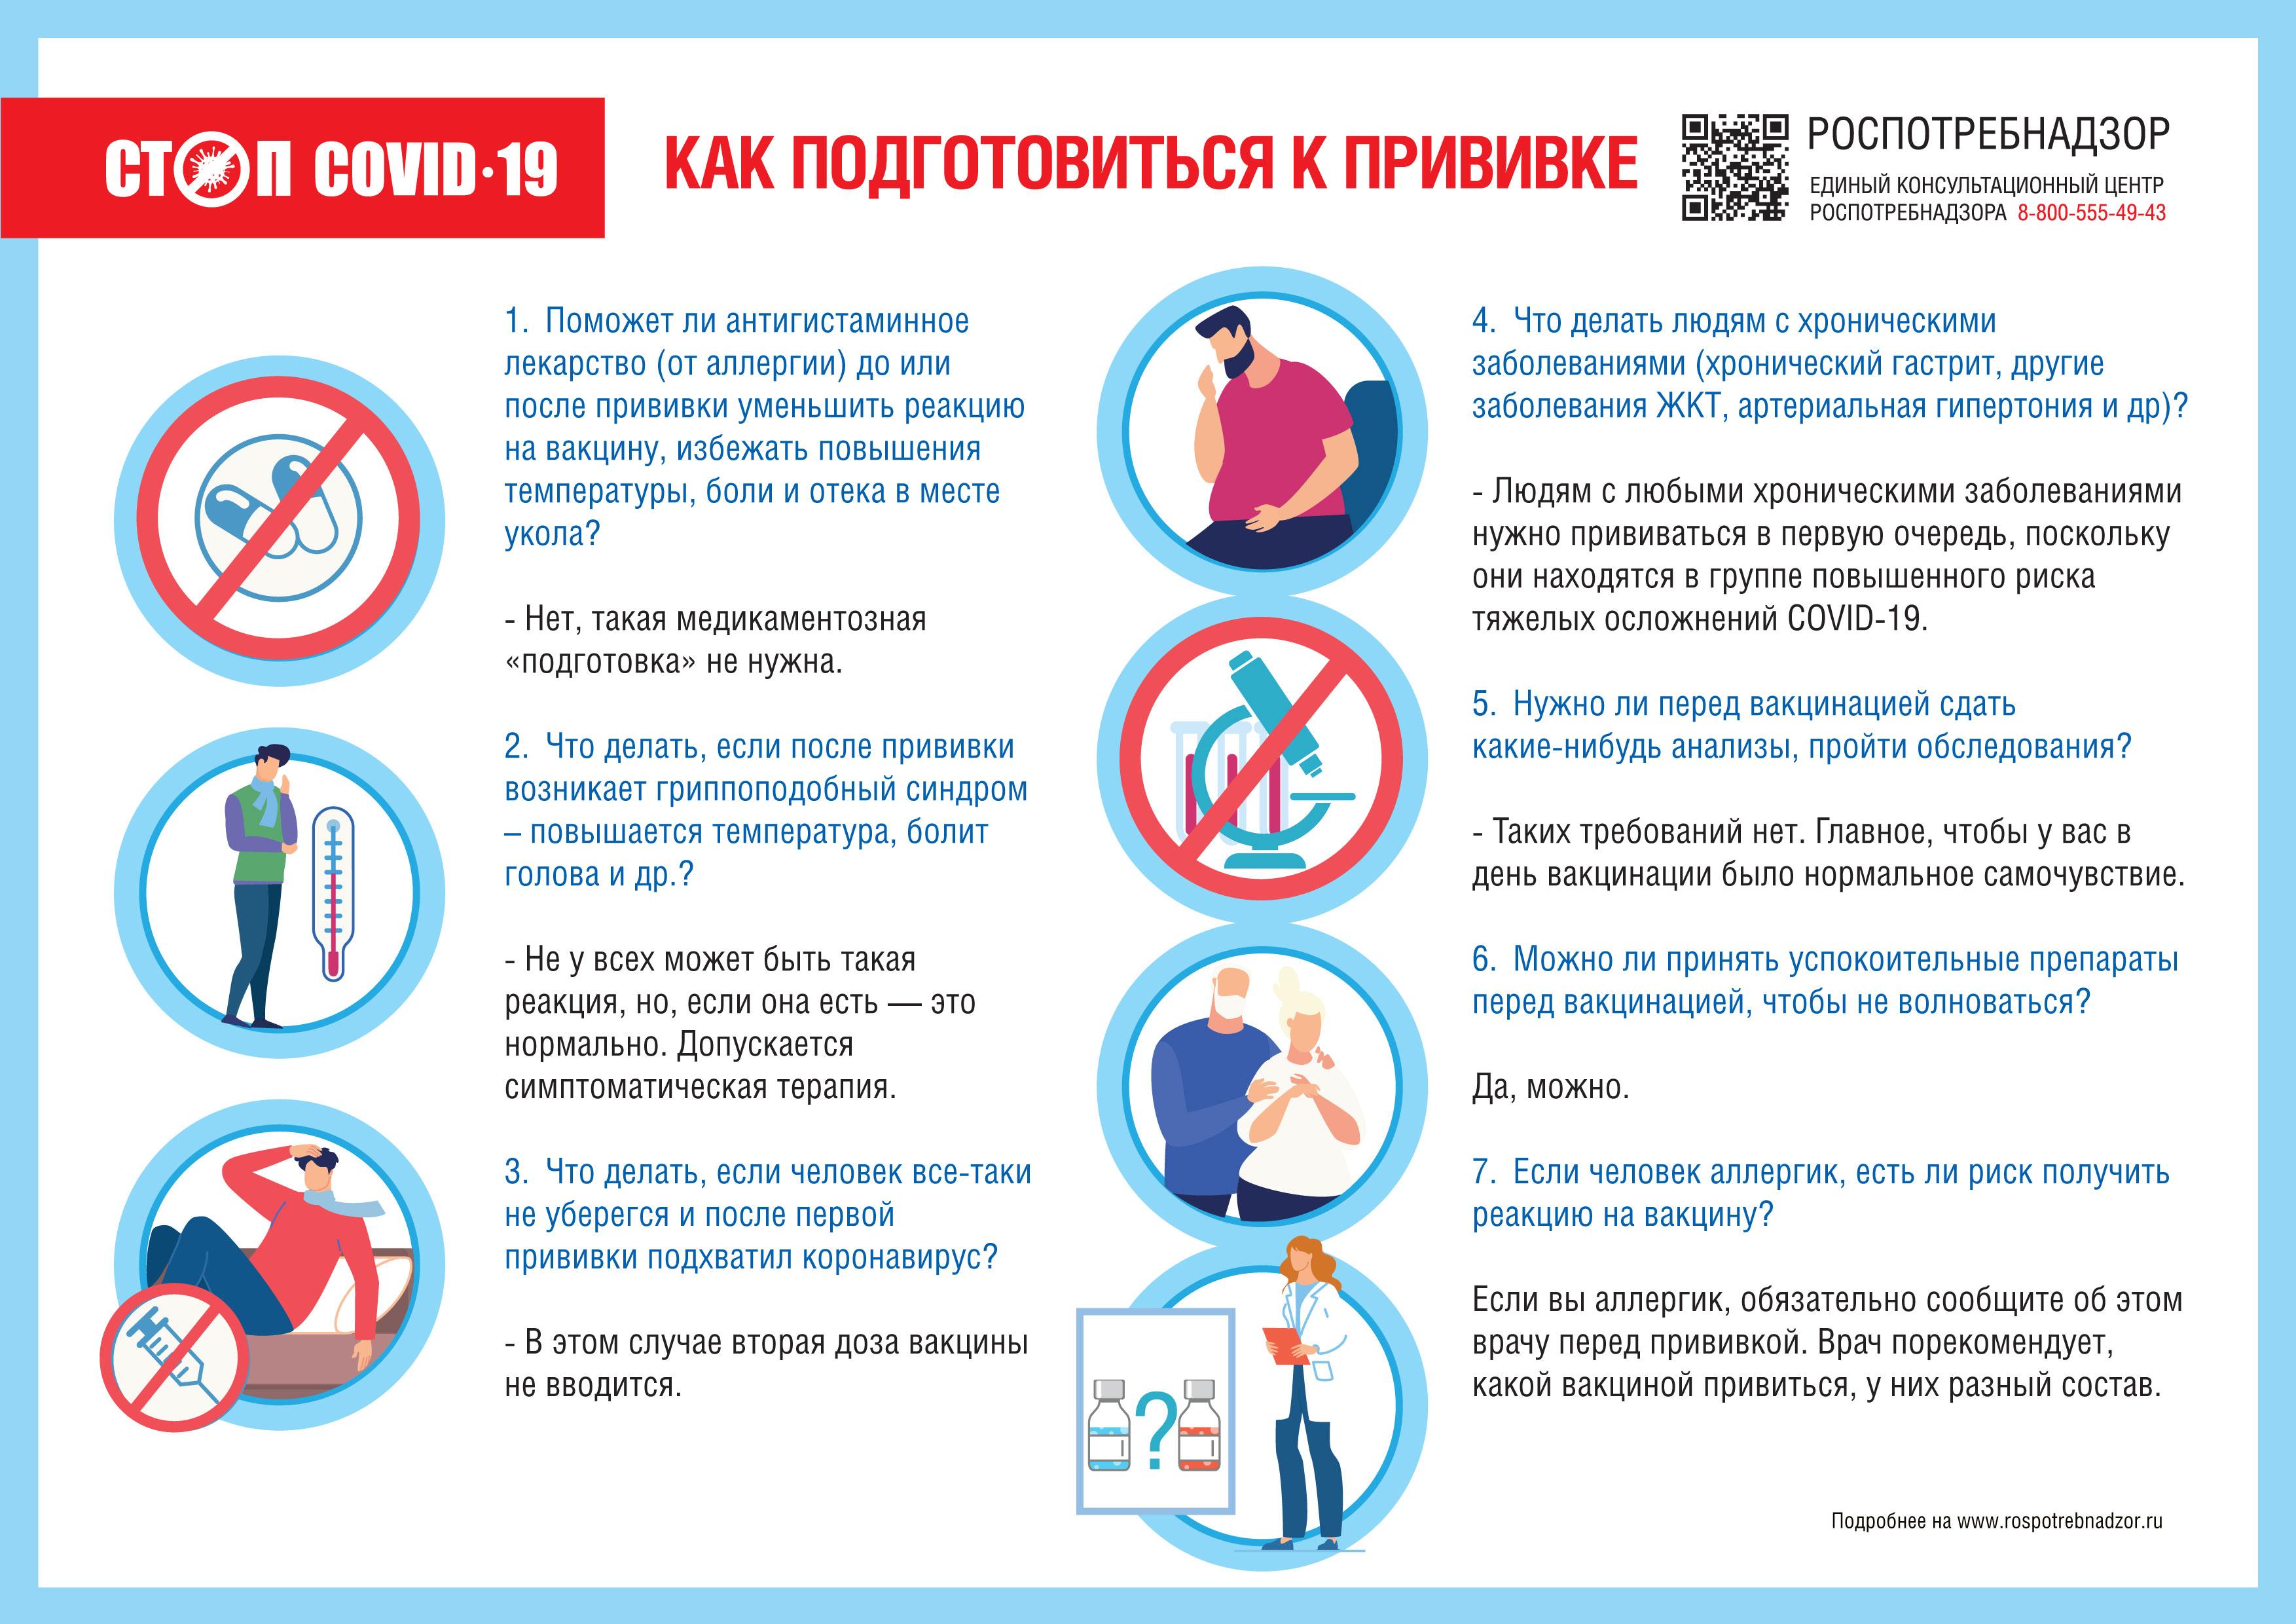 https://www.rospotrebnadzor.ru/files/news2/2021/06/A4-Privivka%20(1).jpg